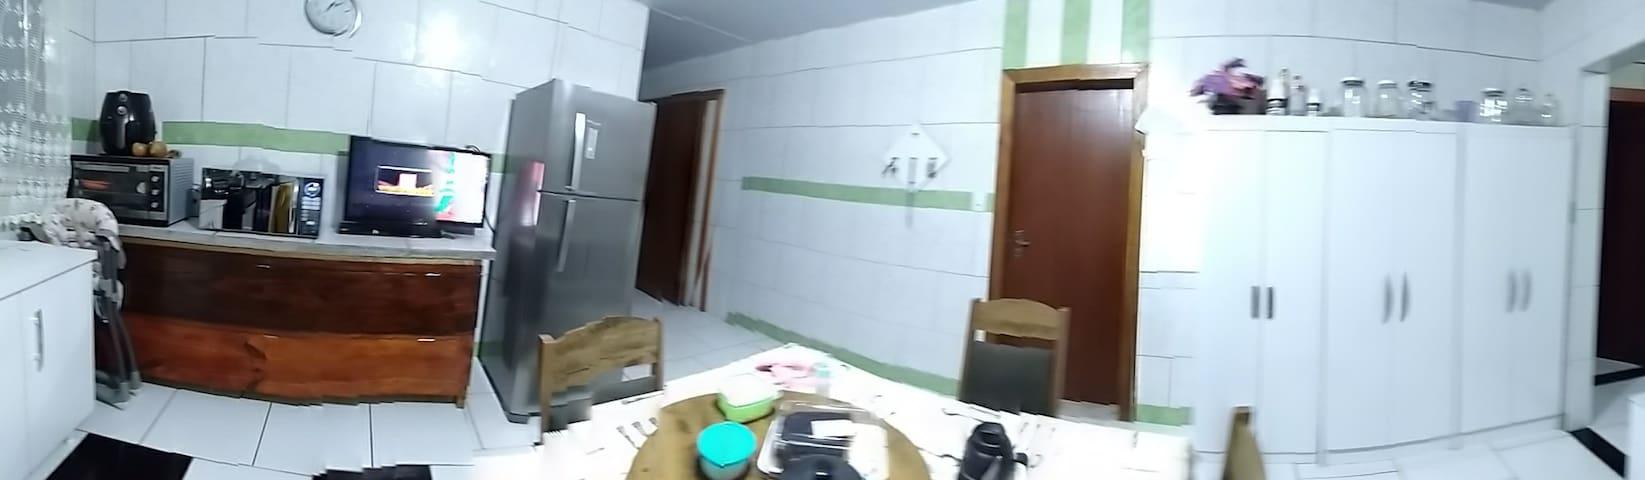 Casa clean, organizada, higienizada